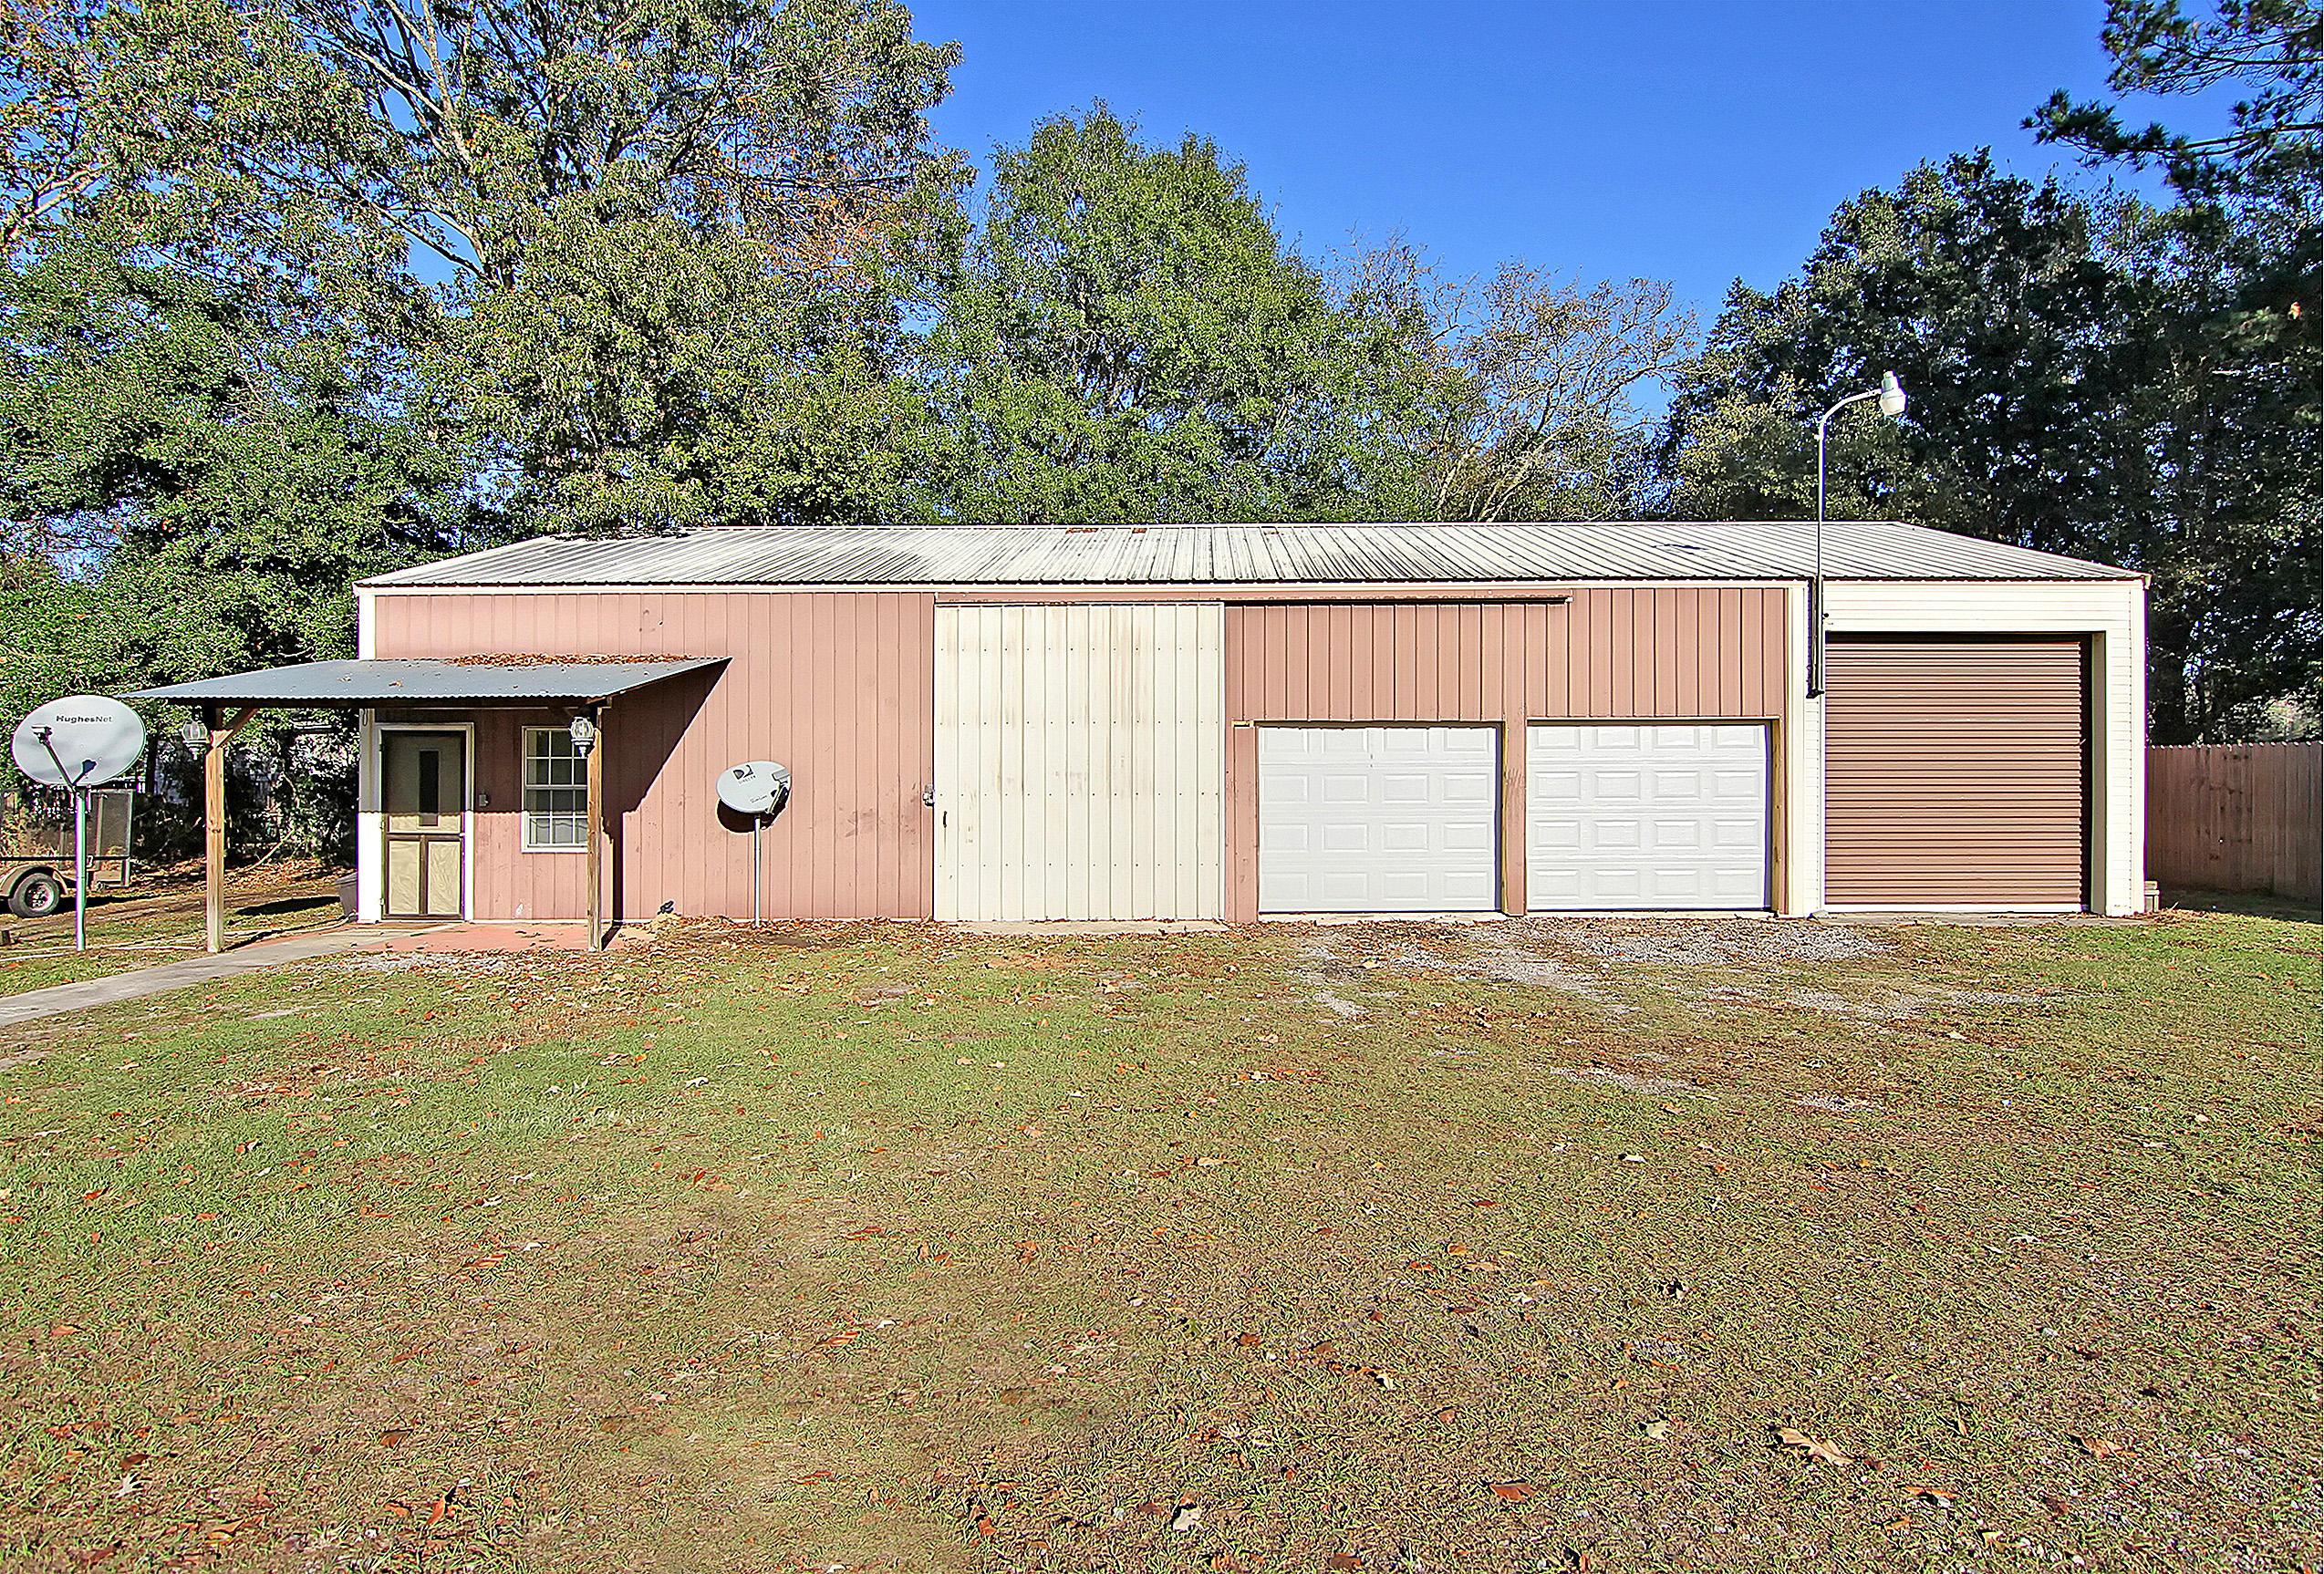 Rainbow Acres Homes For Sale - 428 Rainbow Acres, Moncks Corner, SC - 36